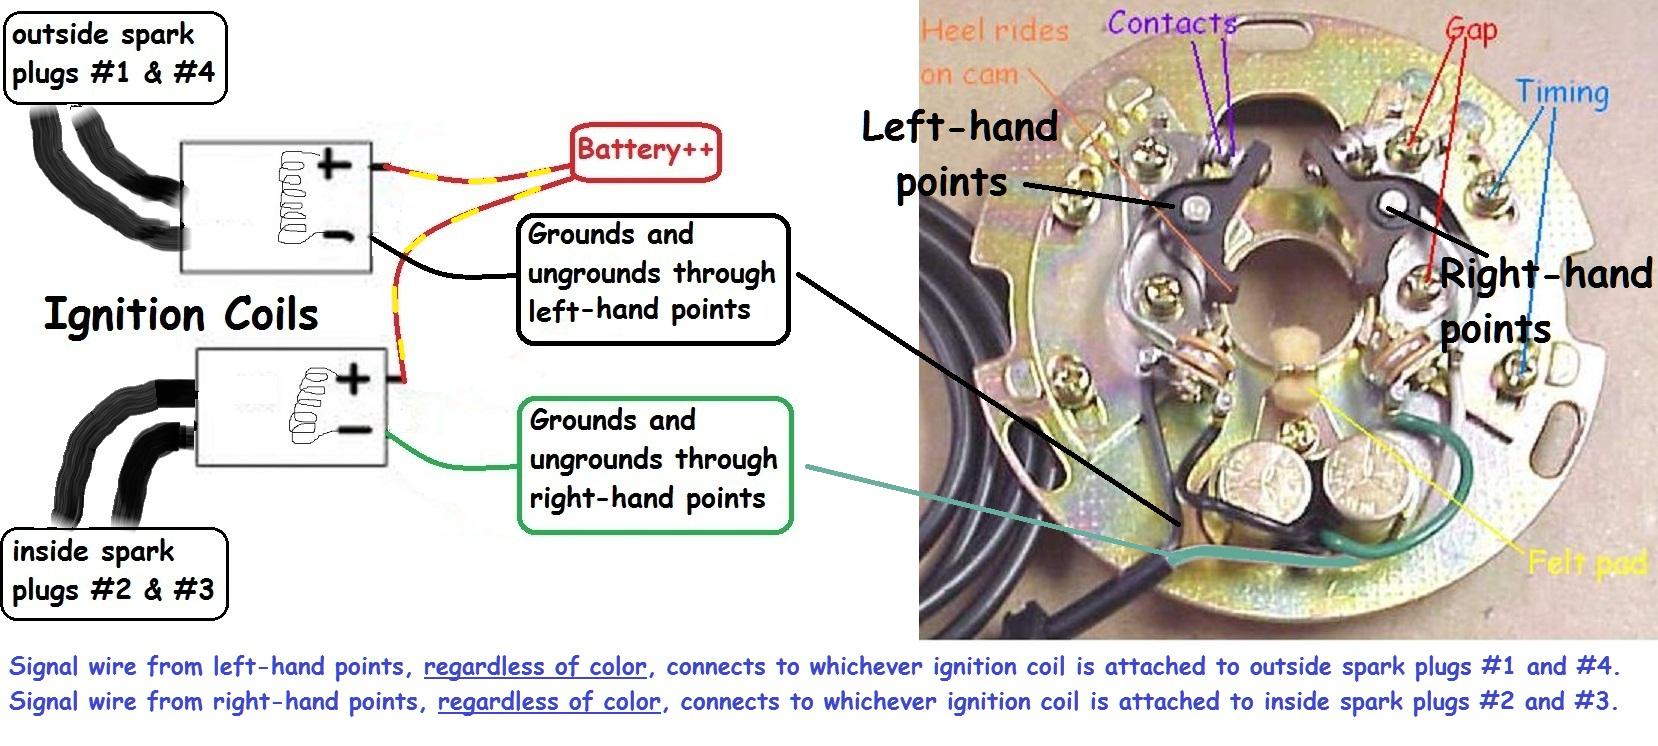 kz1000 wiring diagram neon atom 1979 dyna coil - kzrider forum kzrider, kz, z1 & z motorcycle enthusiast's